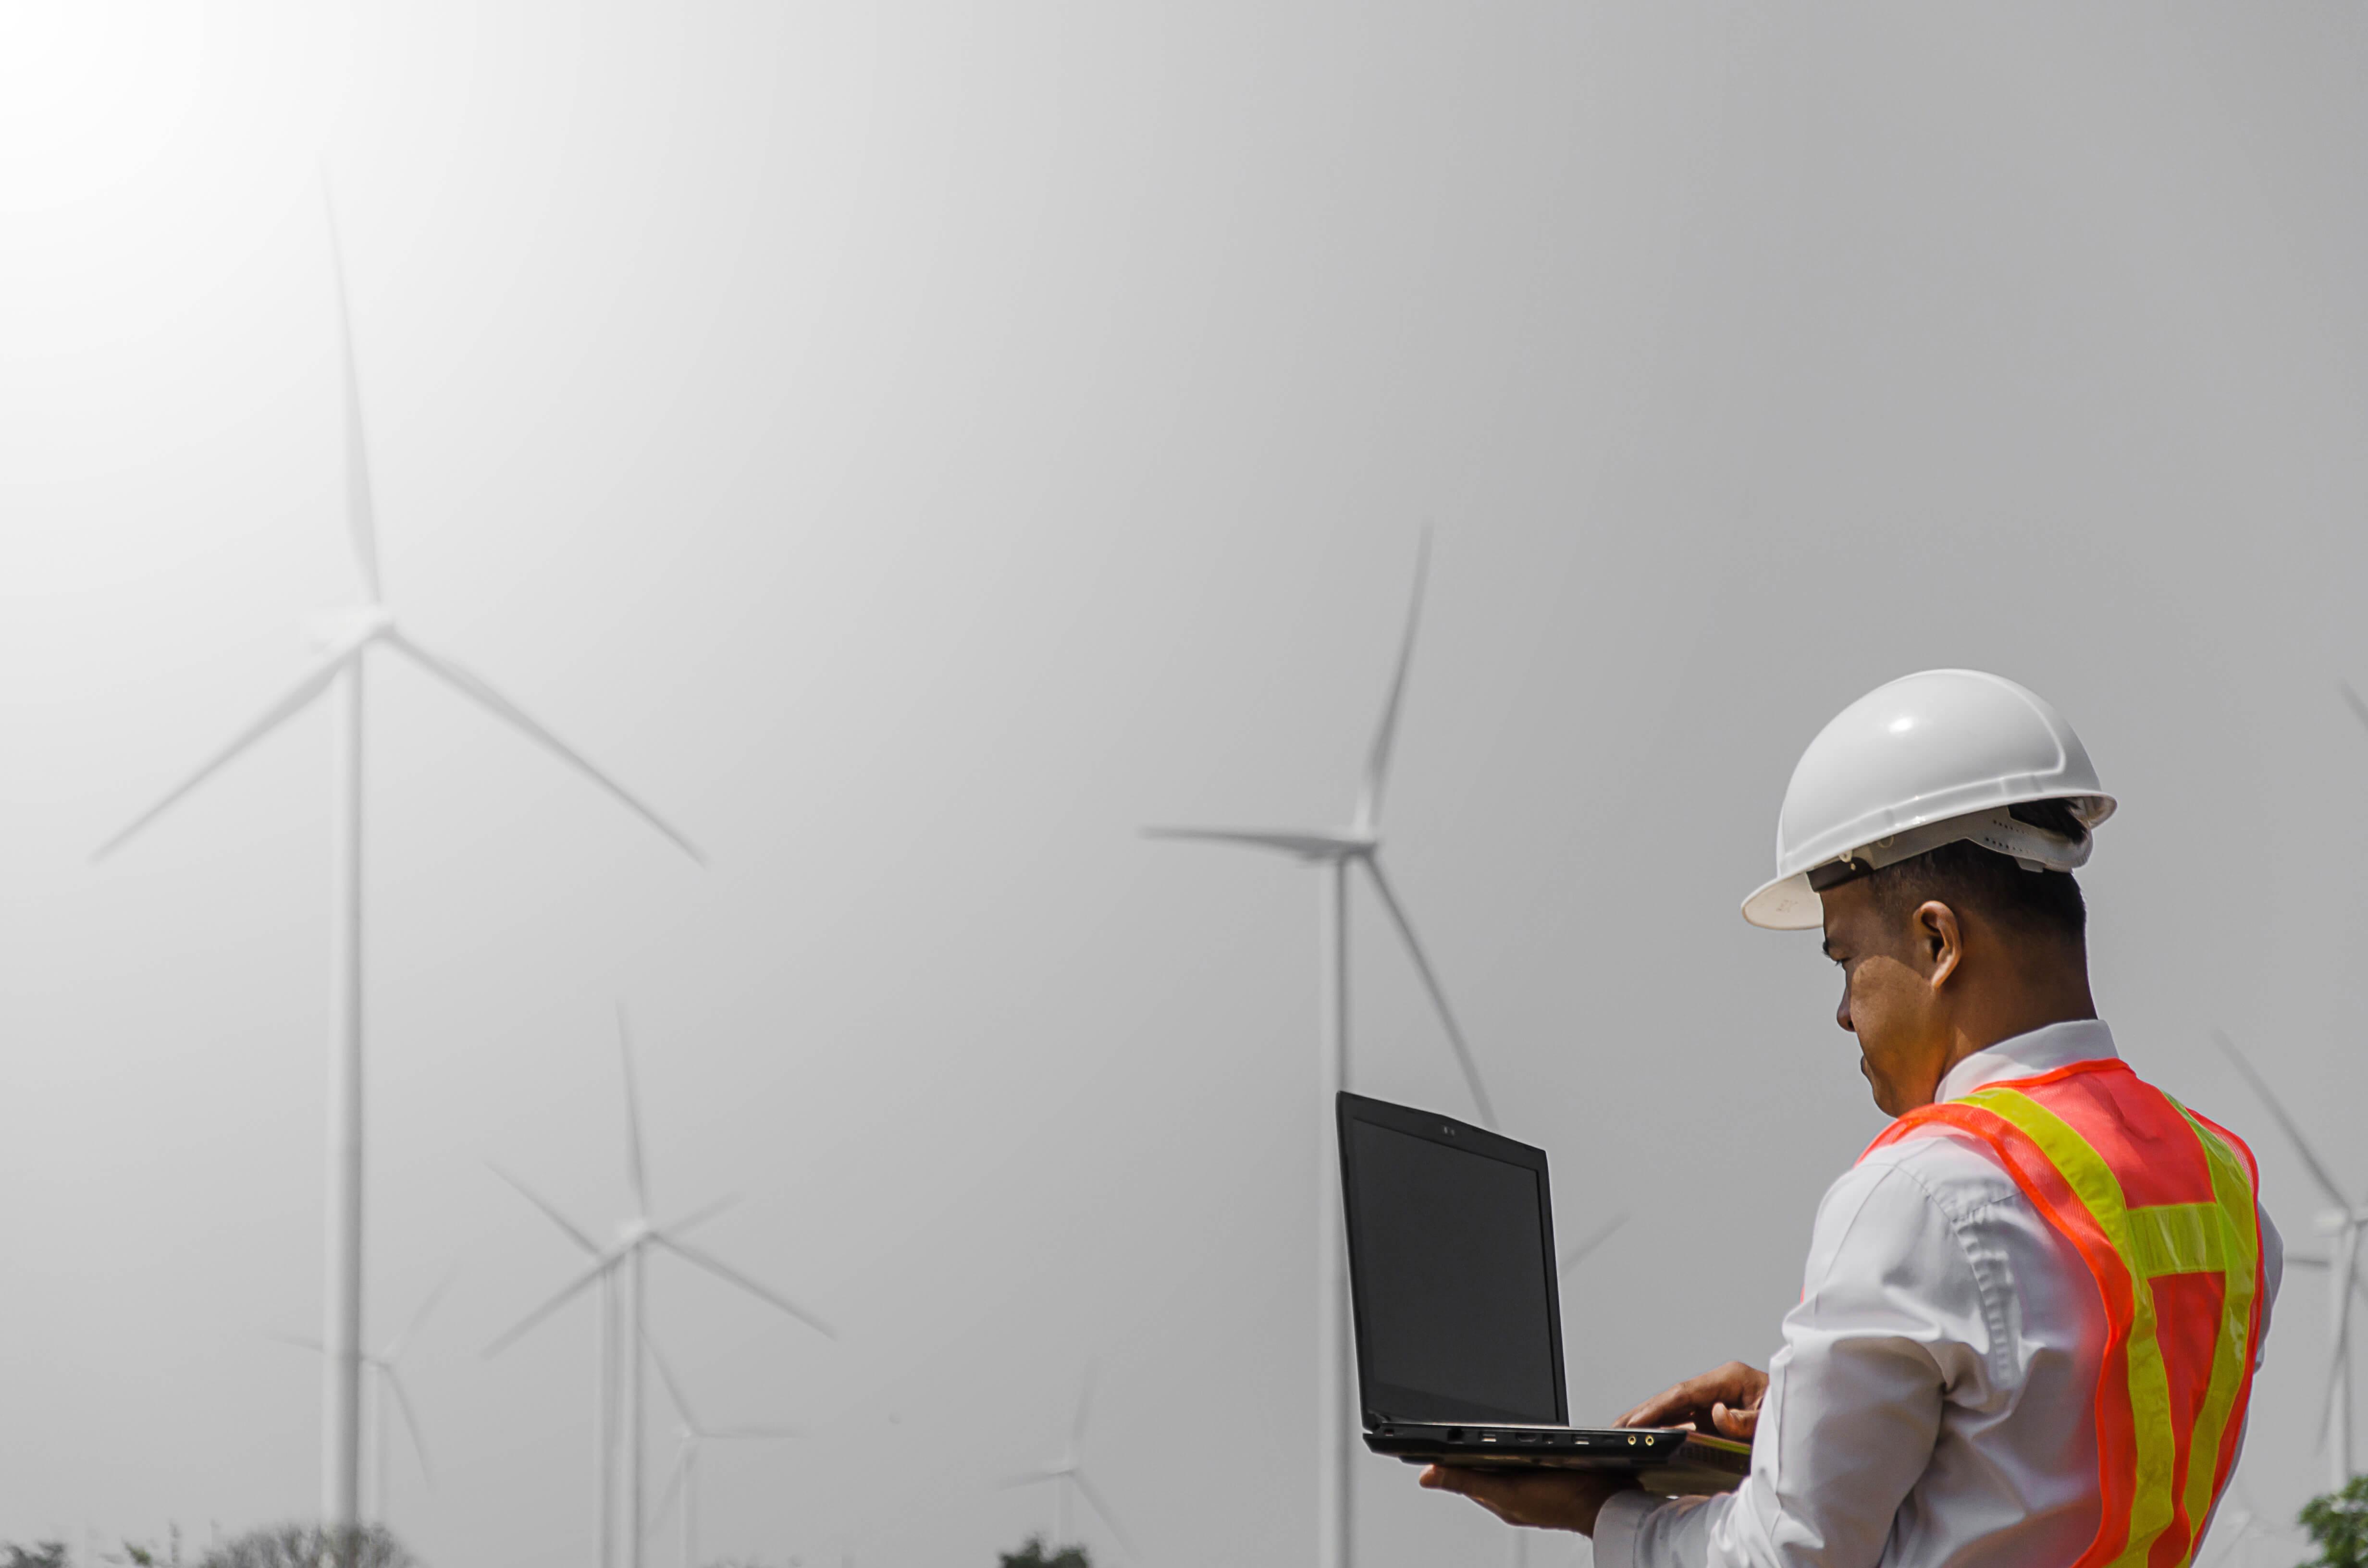 Senior Engineer, Asian men are monitoring system wind turbine el